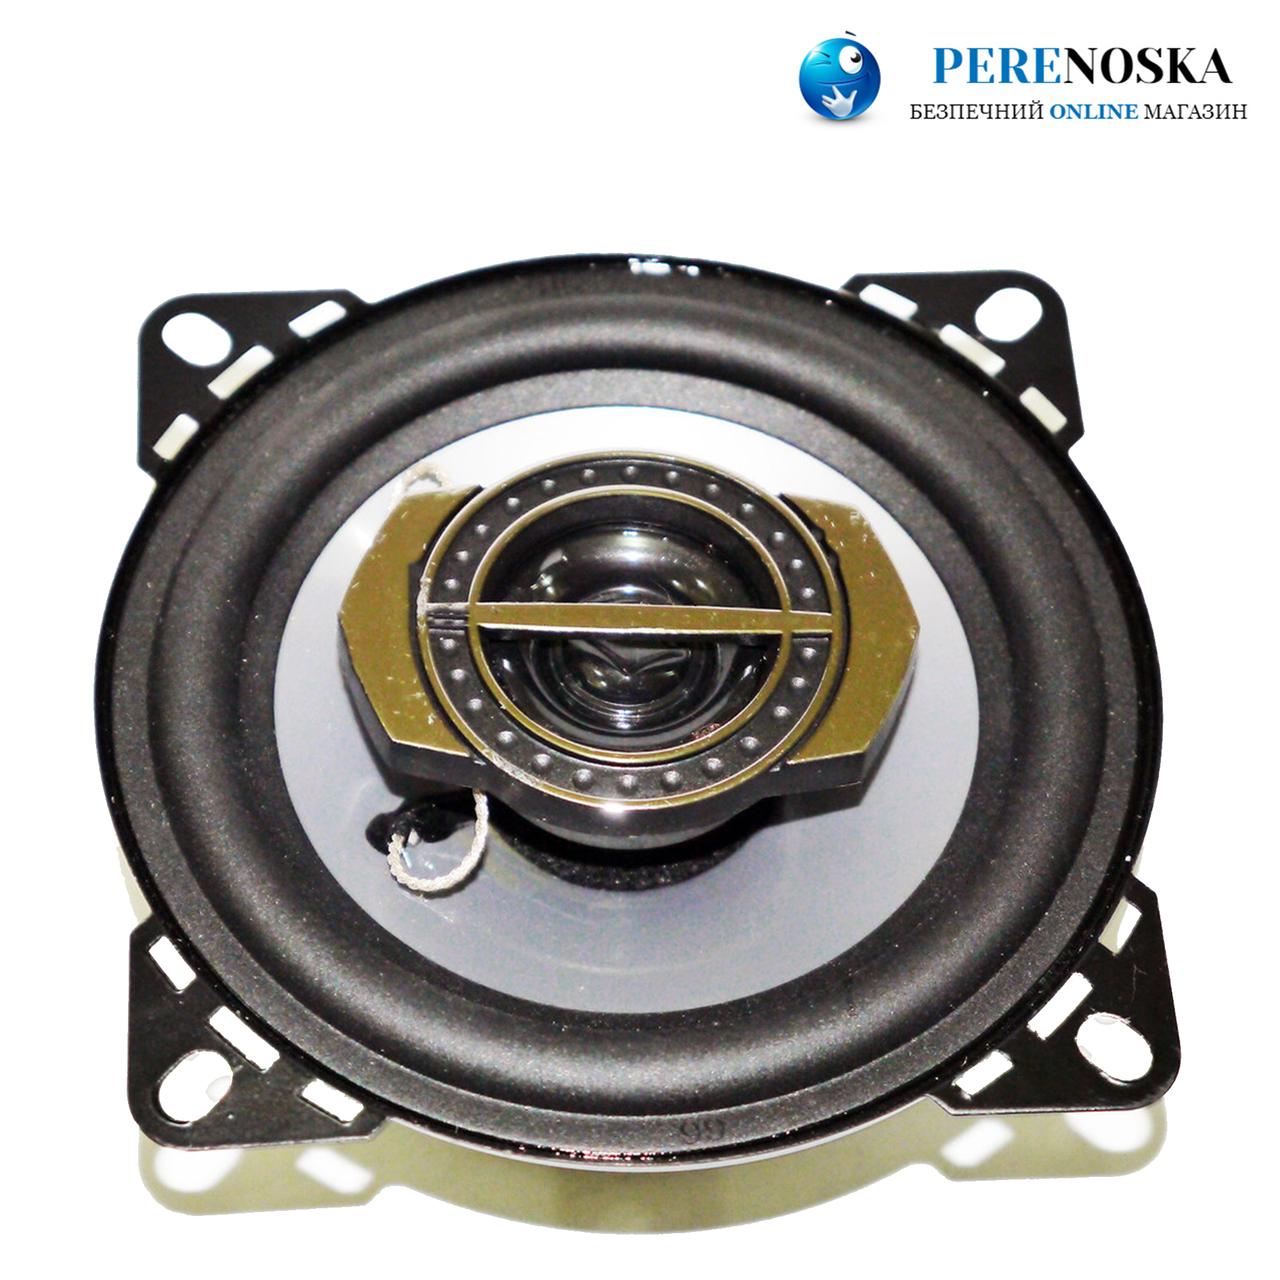 Динамики Pioneer TS-G1095S| 4 дюйма| Мощность 200W